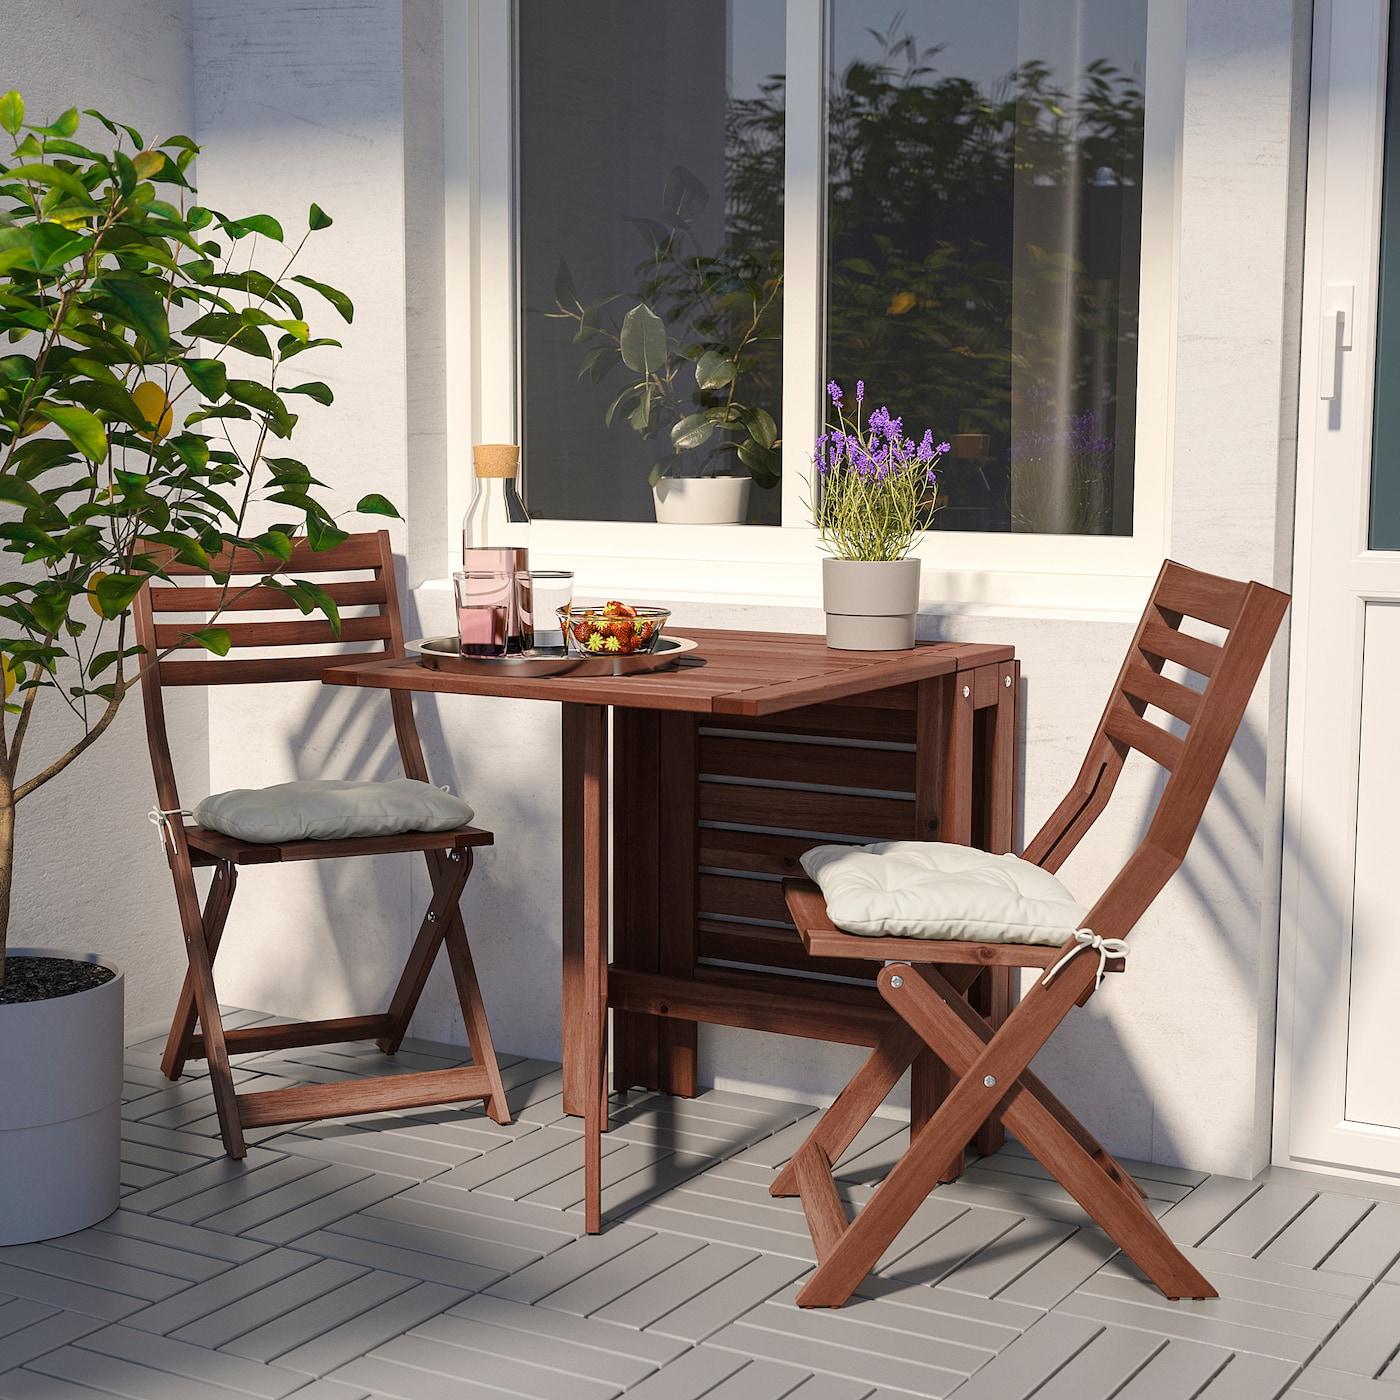 Äpplarö Table Pliante, Extérieur - Brun Teinté Brun 20/77/133X62 Cm dedans Mobilier De Jardin Ikea